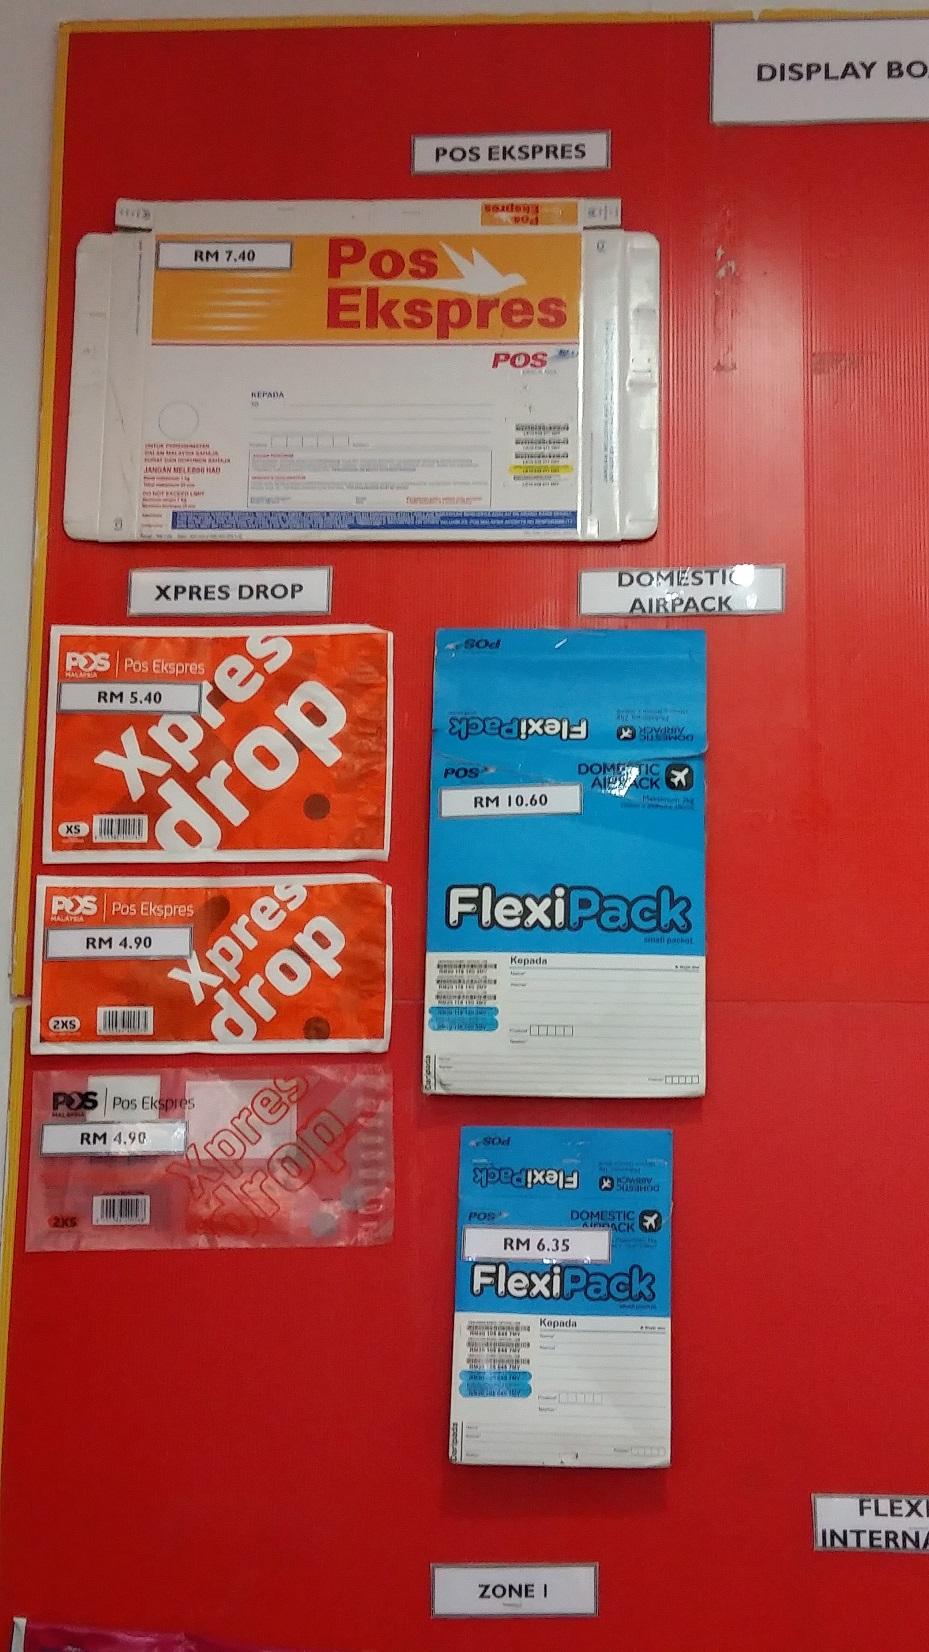 Poslaju Flsxi pack and express drop envelopes